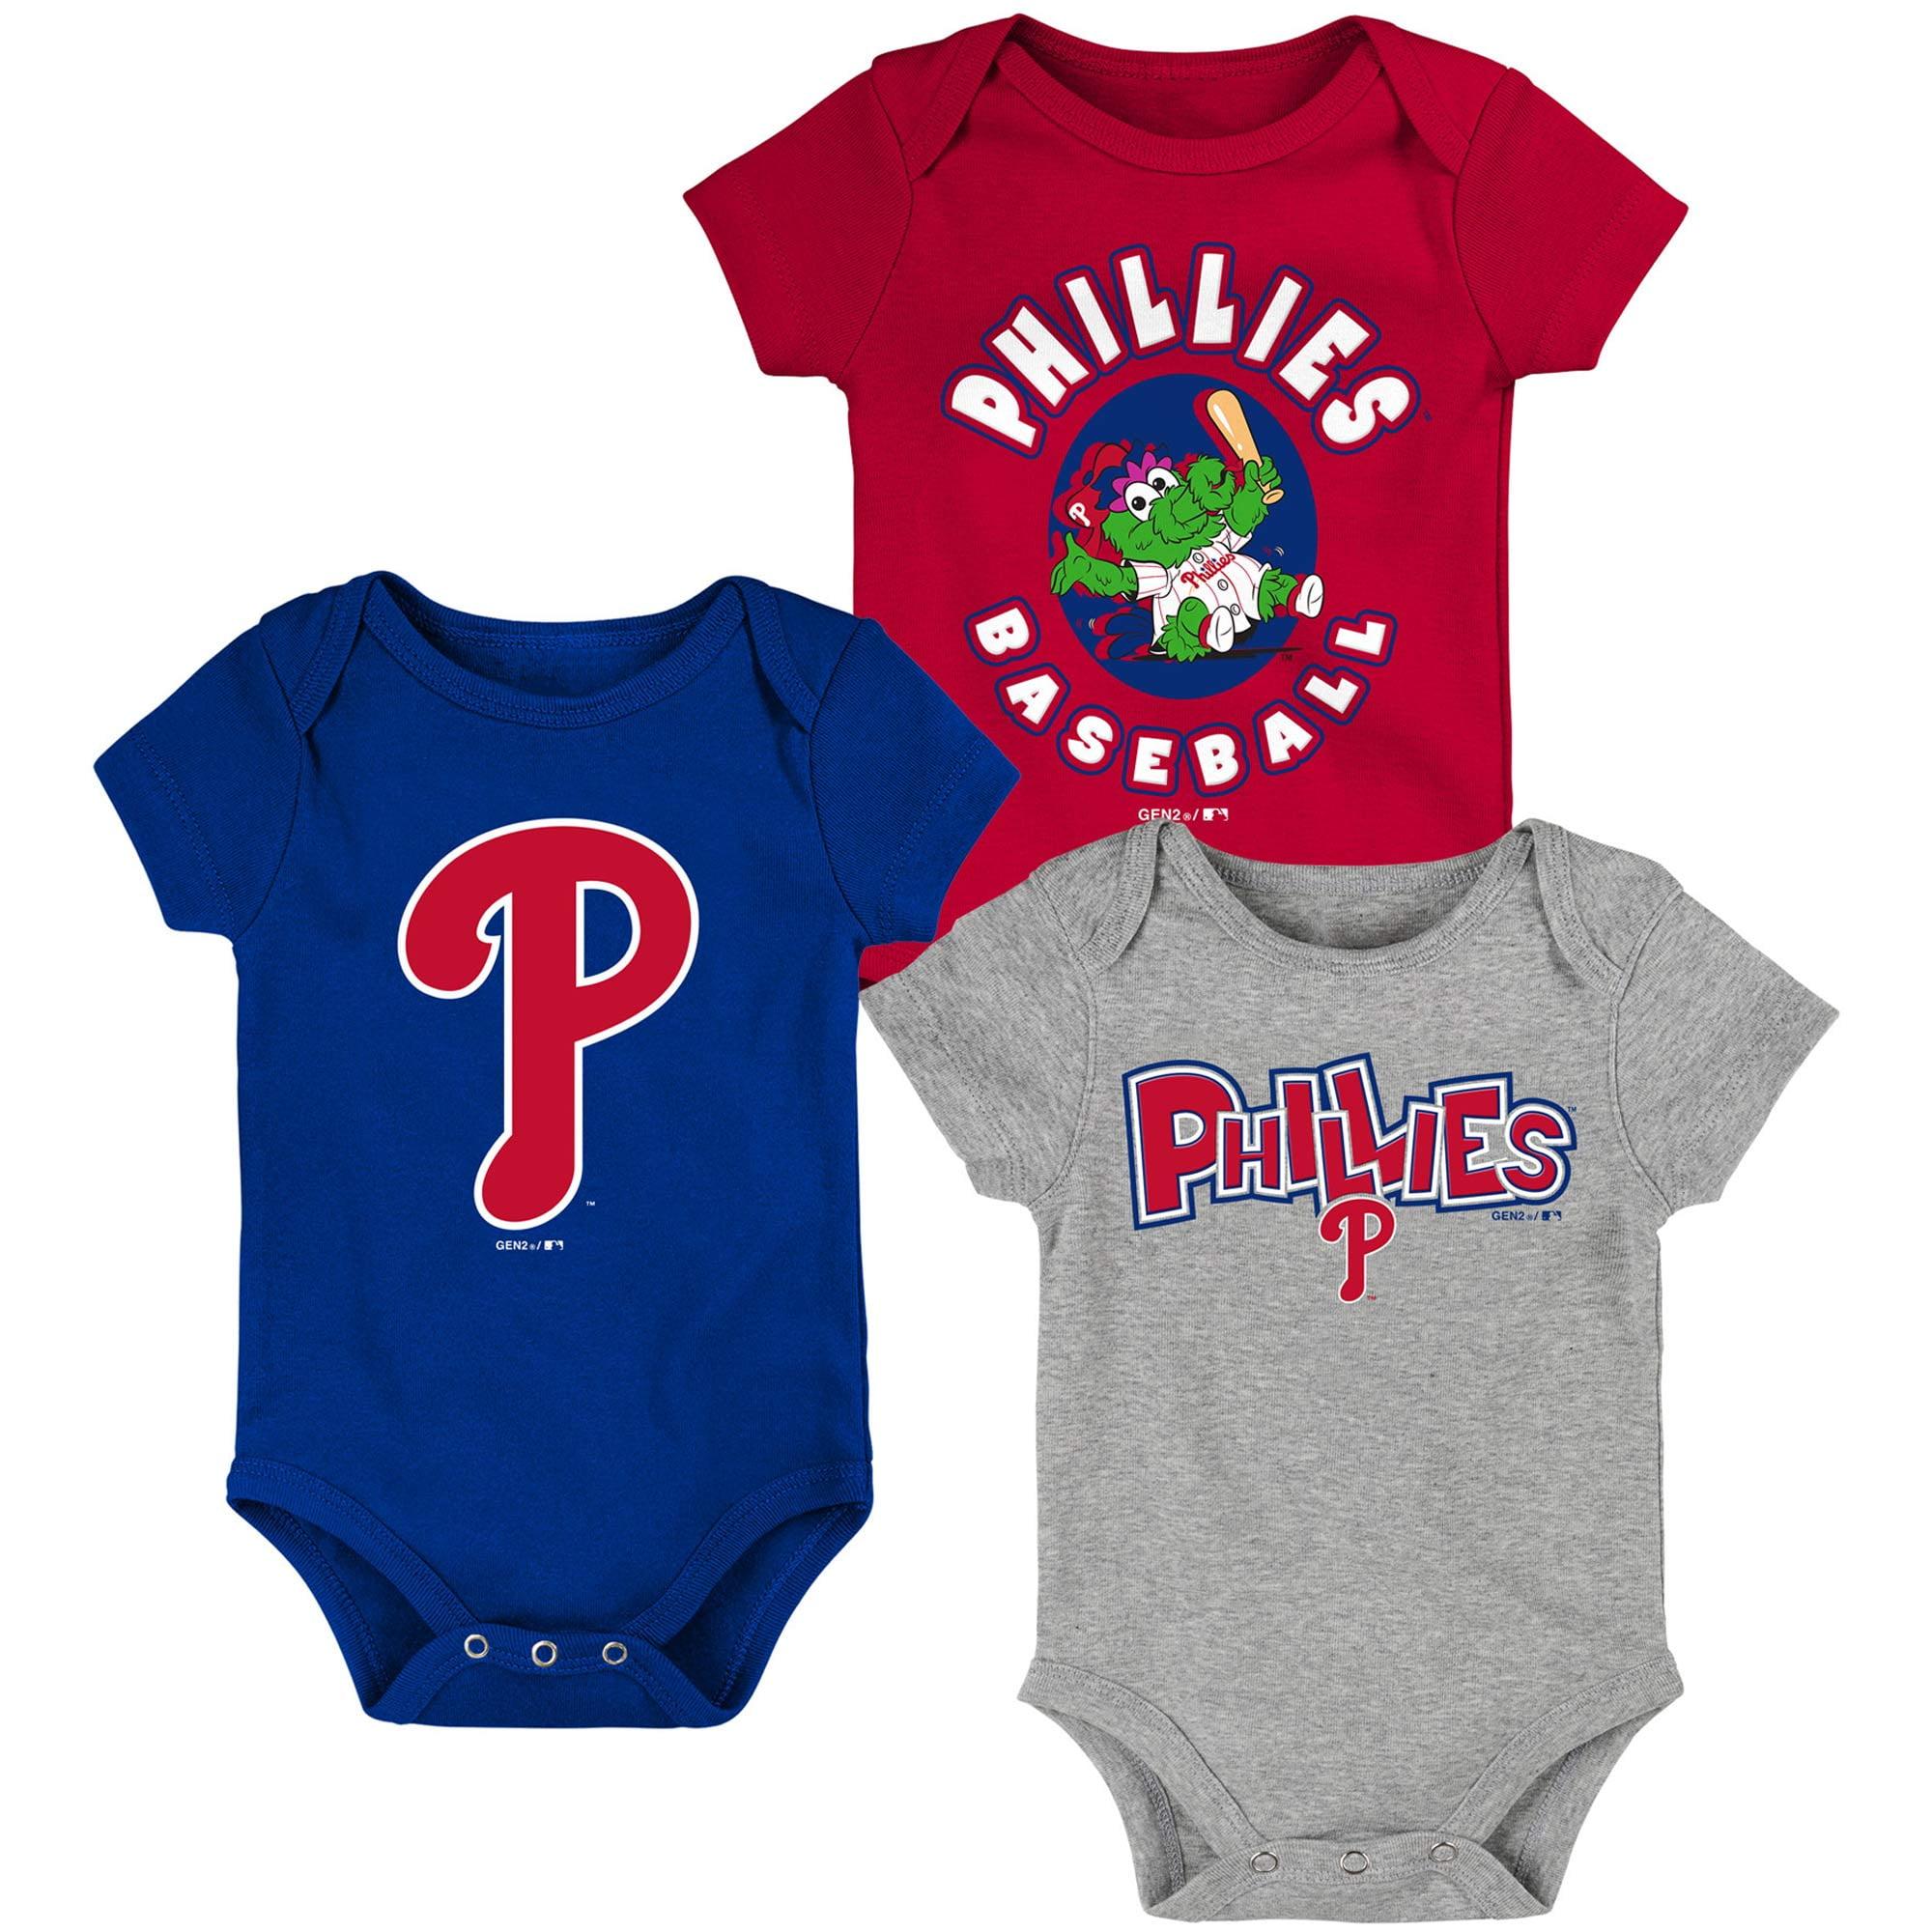 Philadelphia Phillies Newborn & Infant Everyday Fan Three-Pack Bodysuit Set - Red/Royal/Heathered Gray